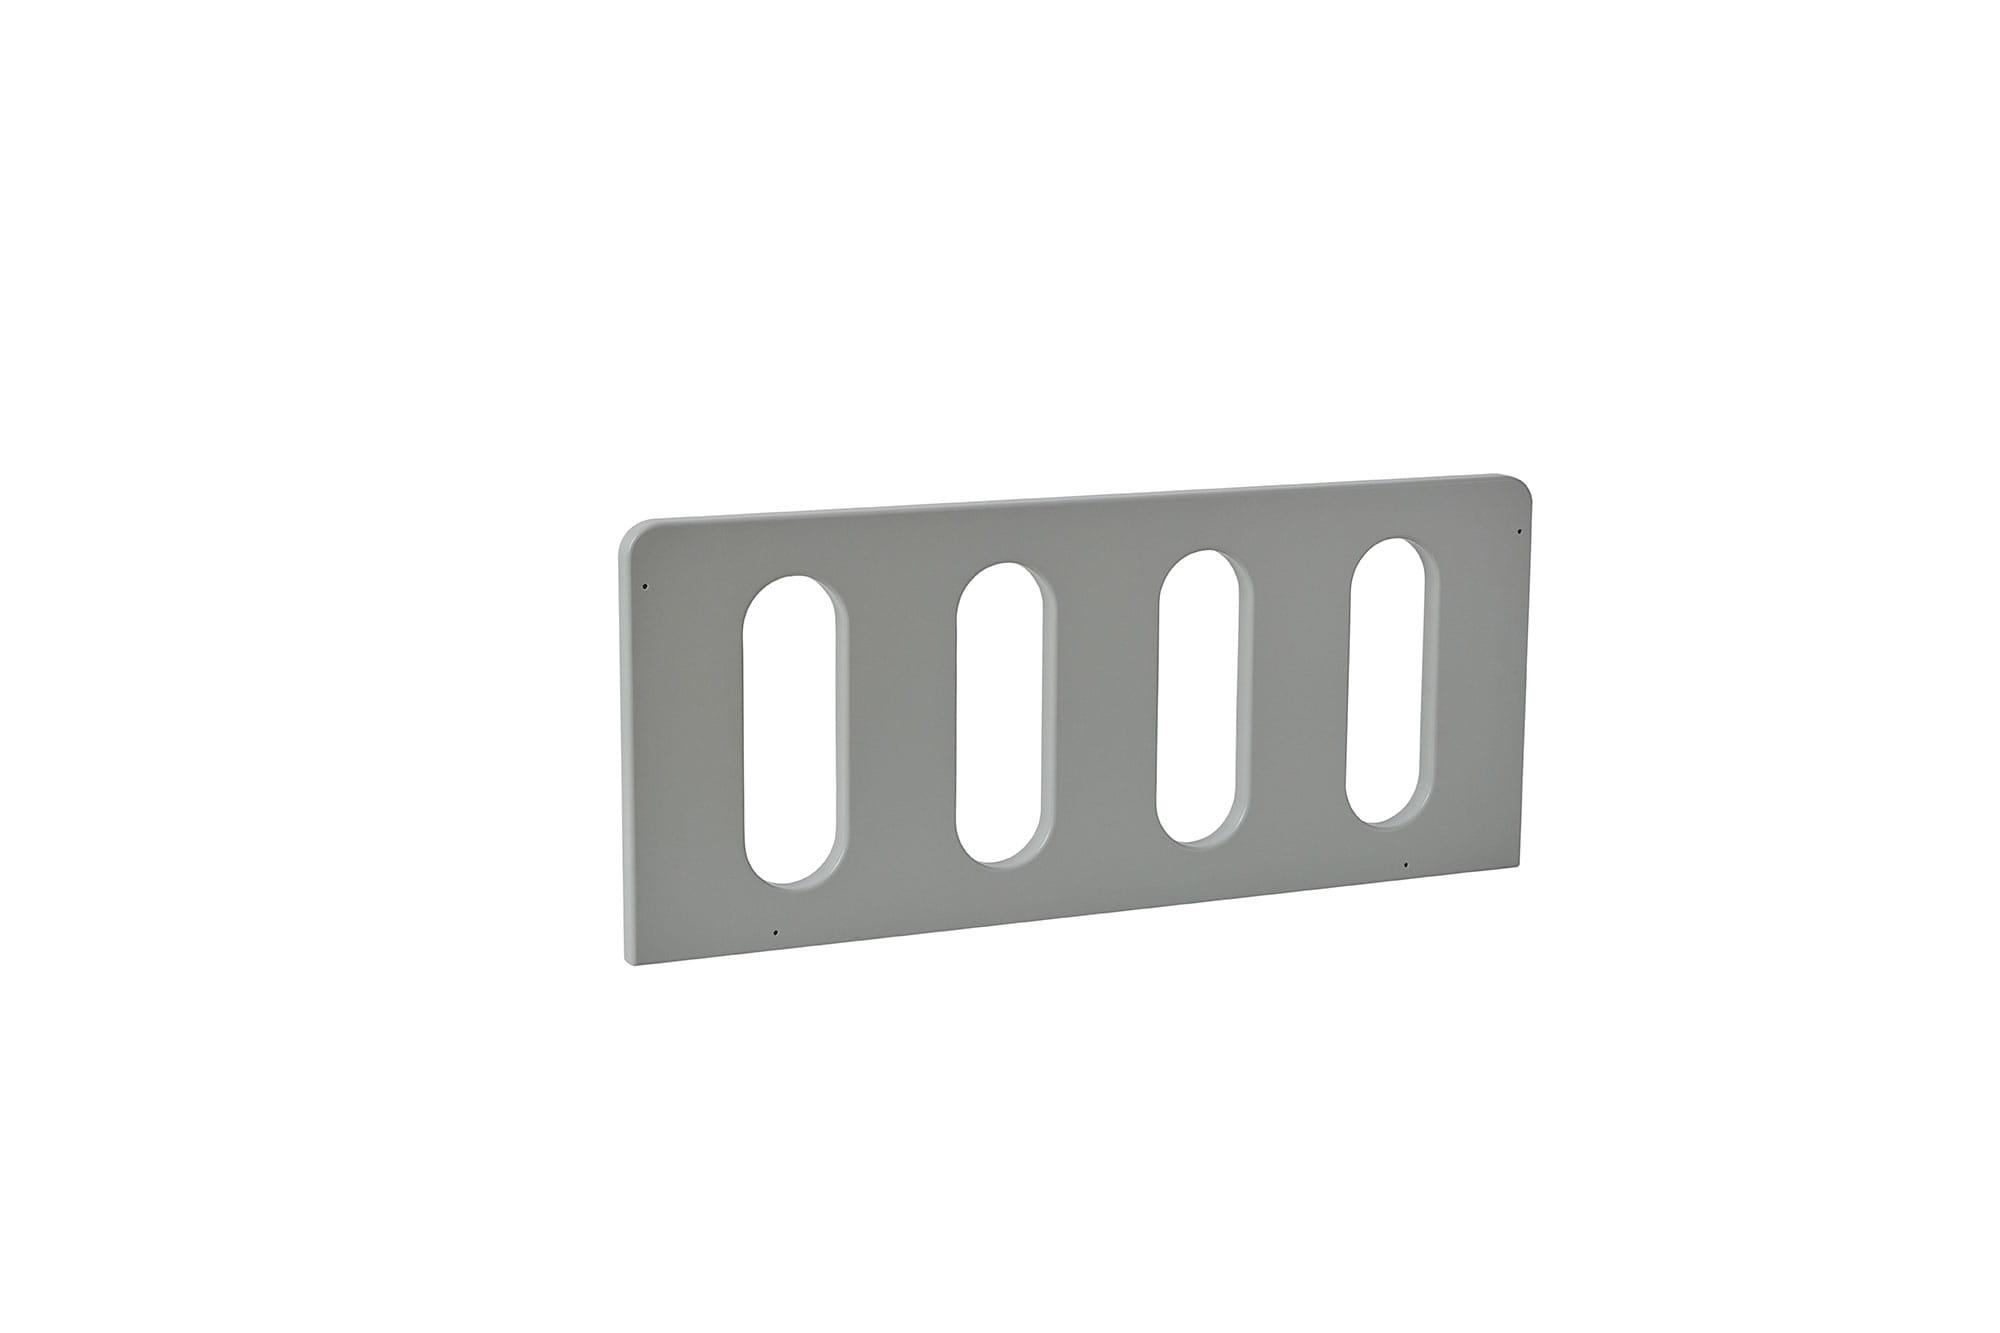 Pinio Modern Barierka Do łóżka Domek 160x70 2 Szt